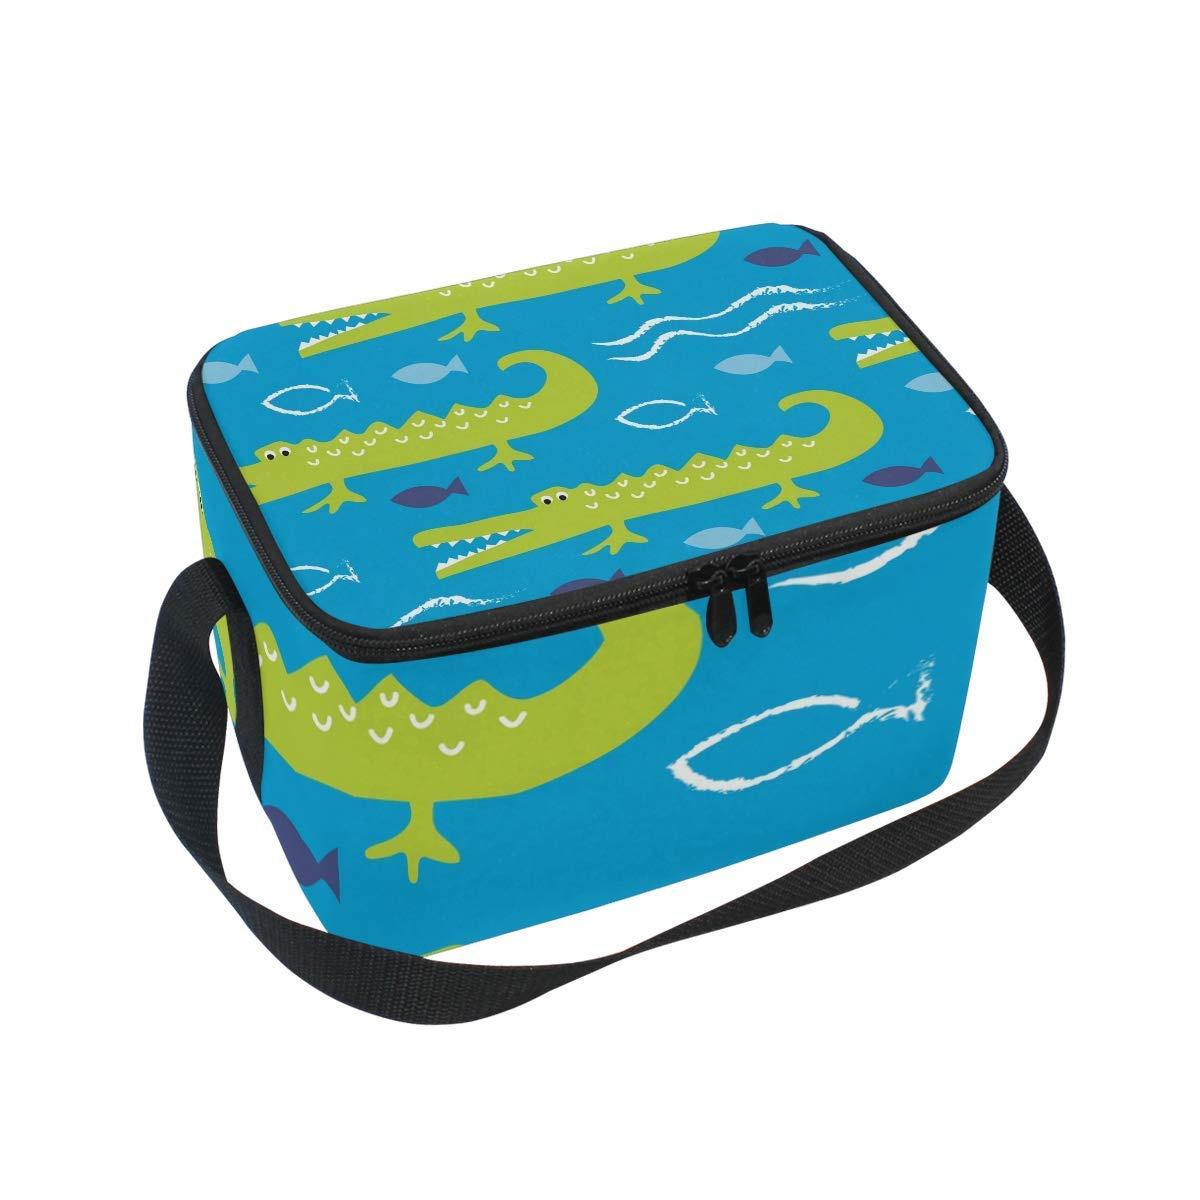 905b1ffef876 DEZIRO Cute Crocodile Kids Lunch Box Cooler Bag